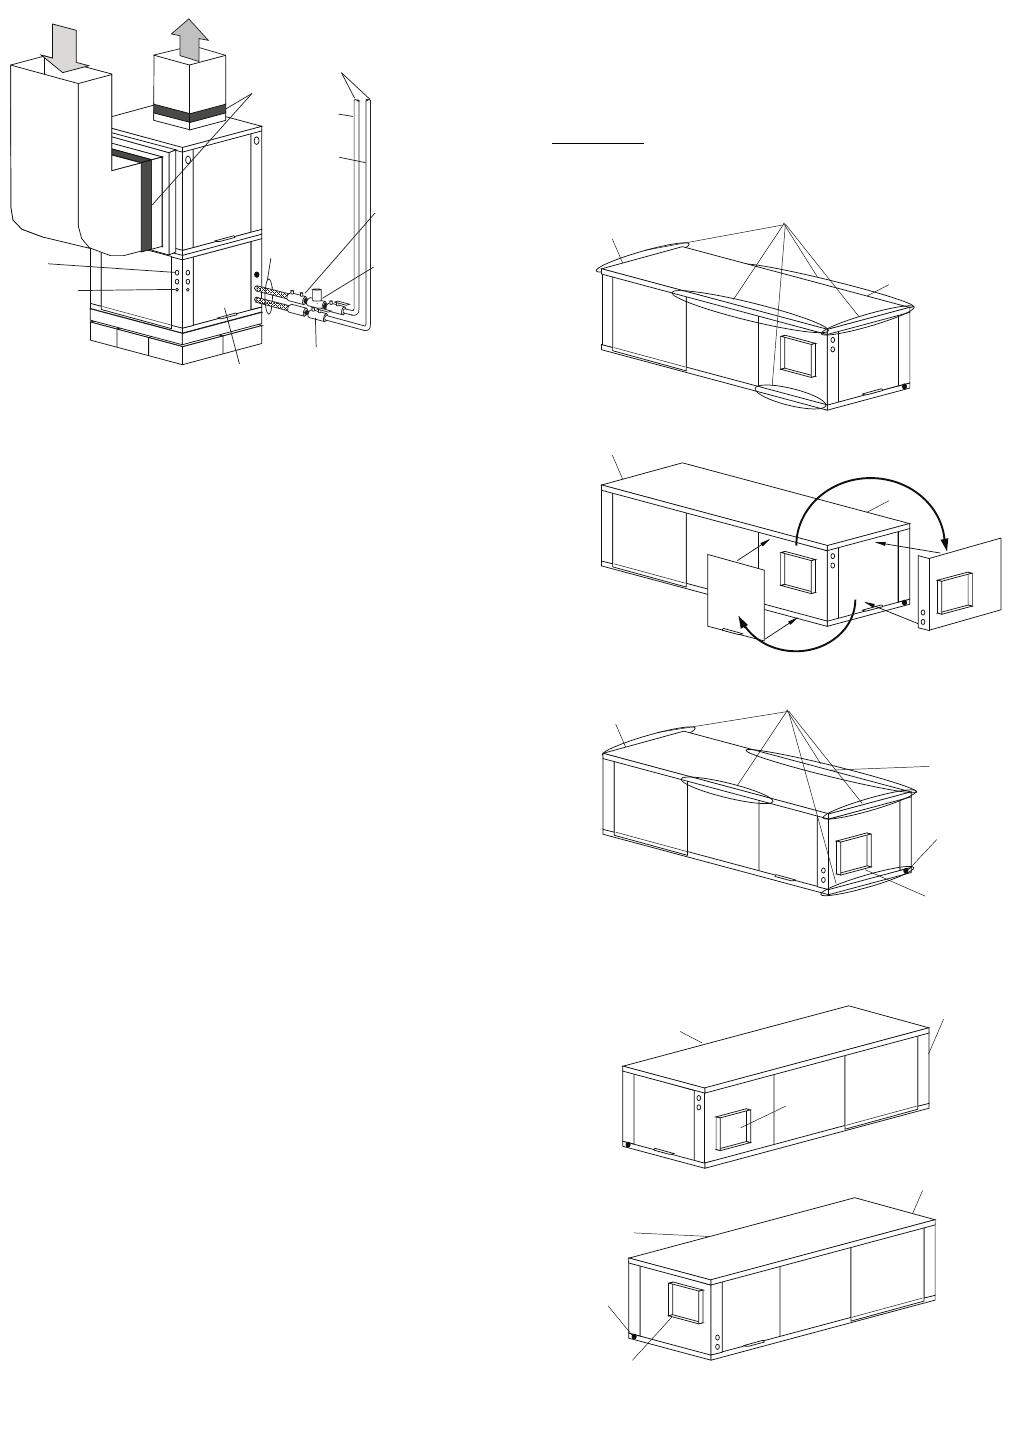 Ideal Clic Boiler Wiring Diagram.html